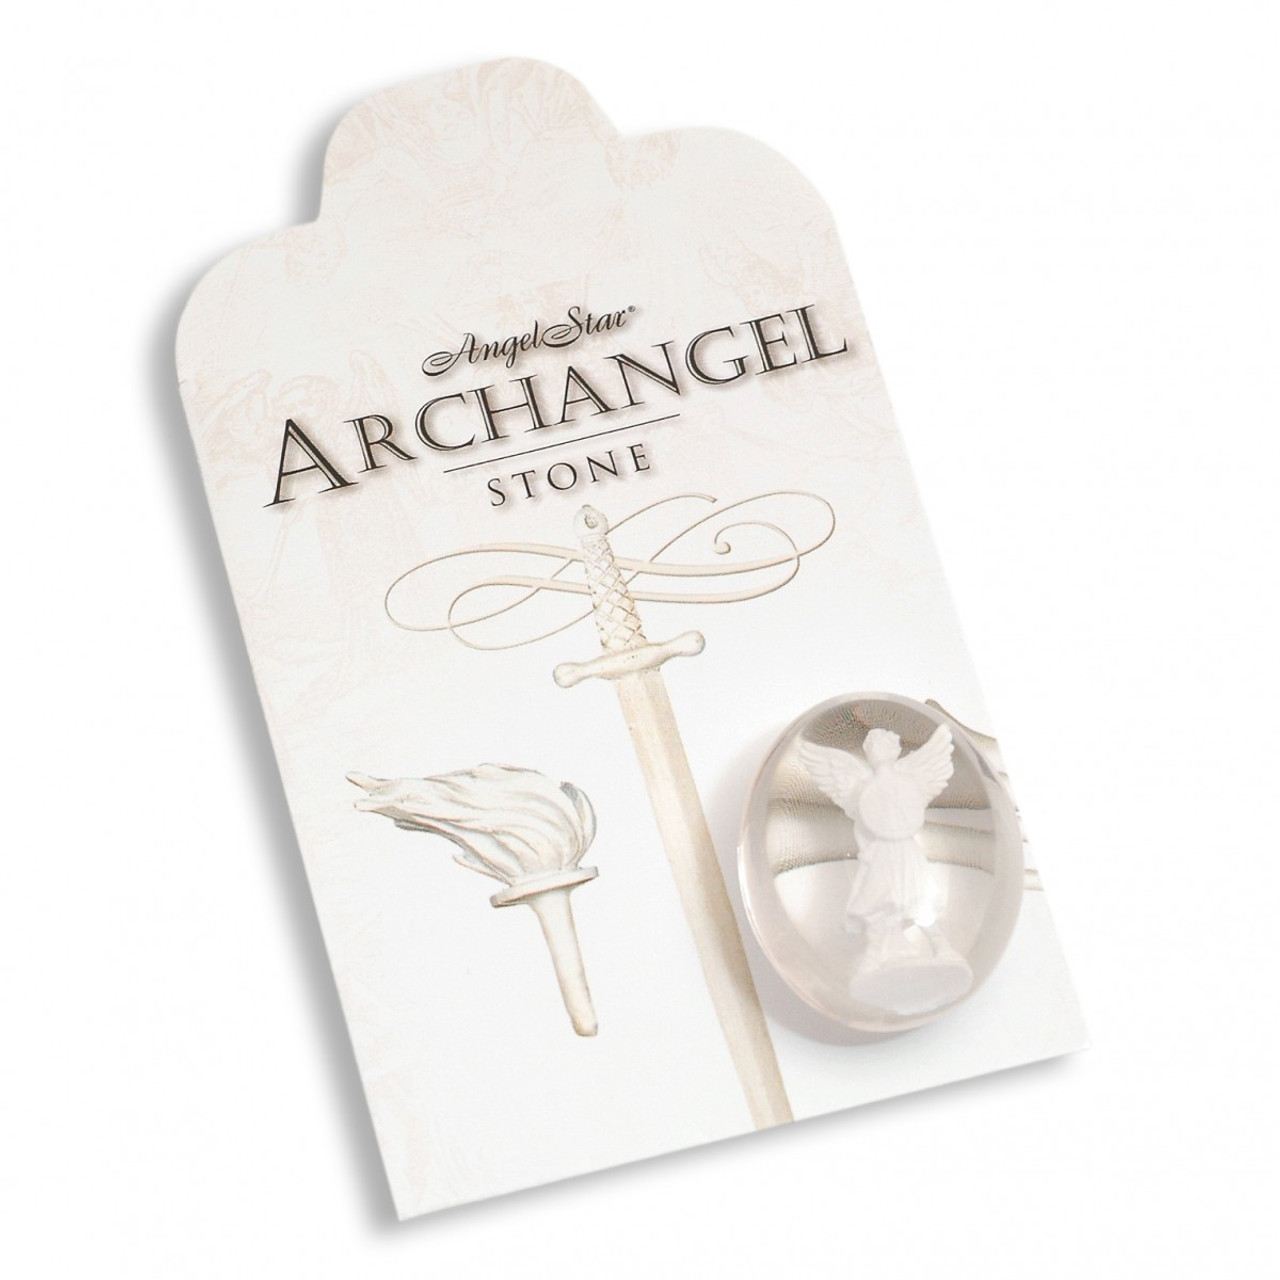 Archangel Stone - Michael